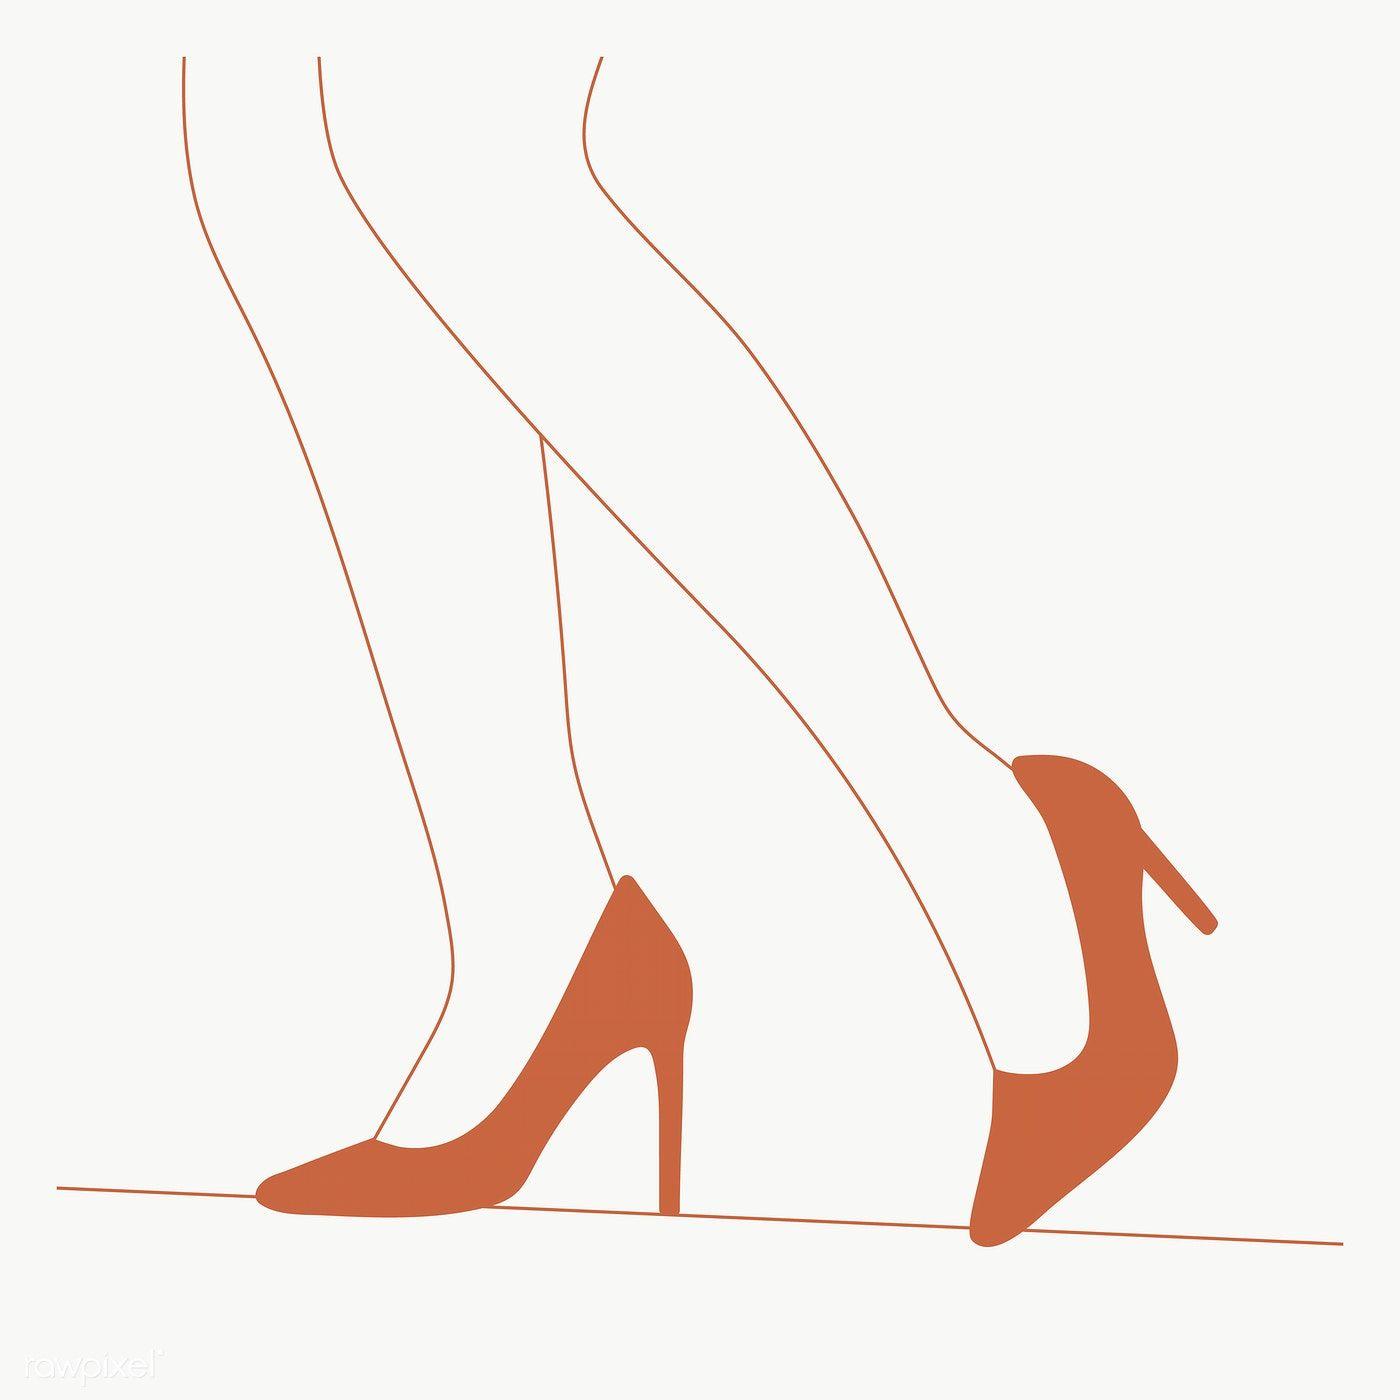 Download Premium Png Of Woman Legs In High Heel Shoes Transparent Png Women Legs Shoes Heels High Heel Shoes